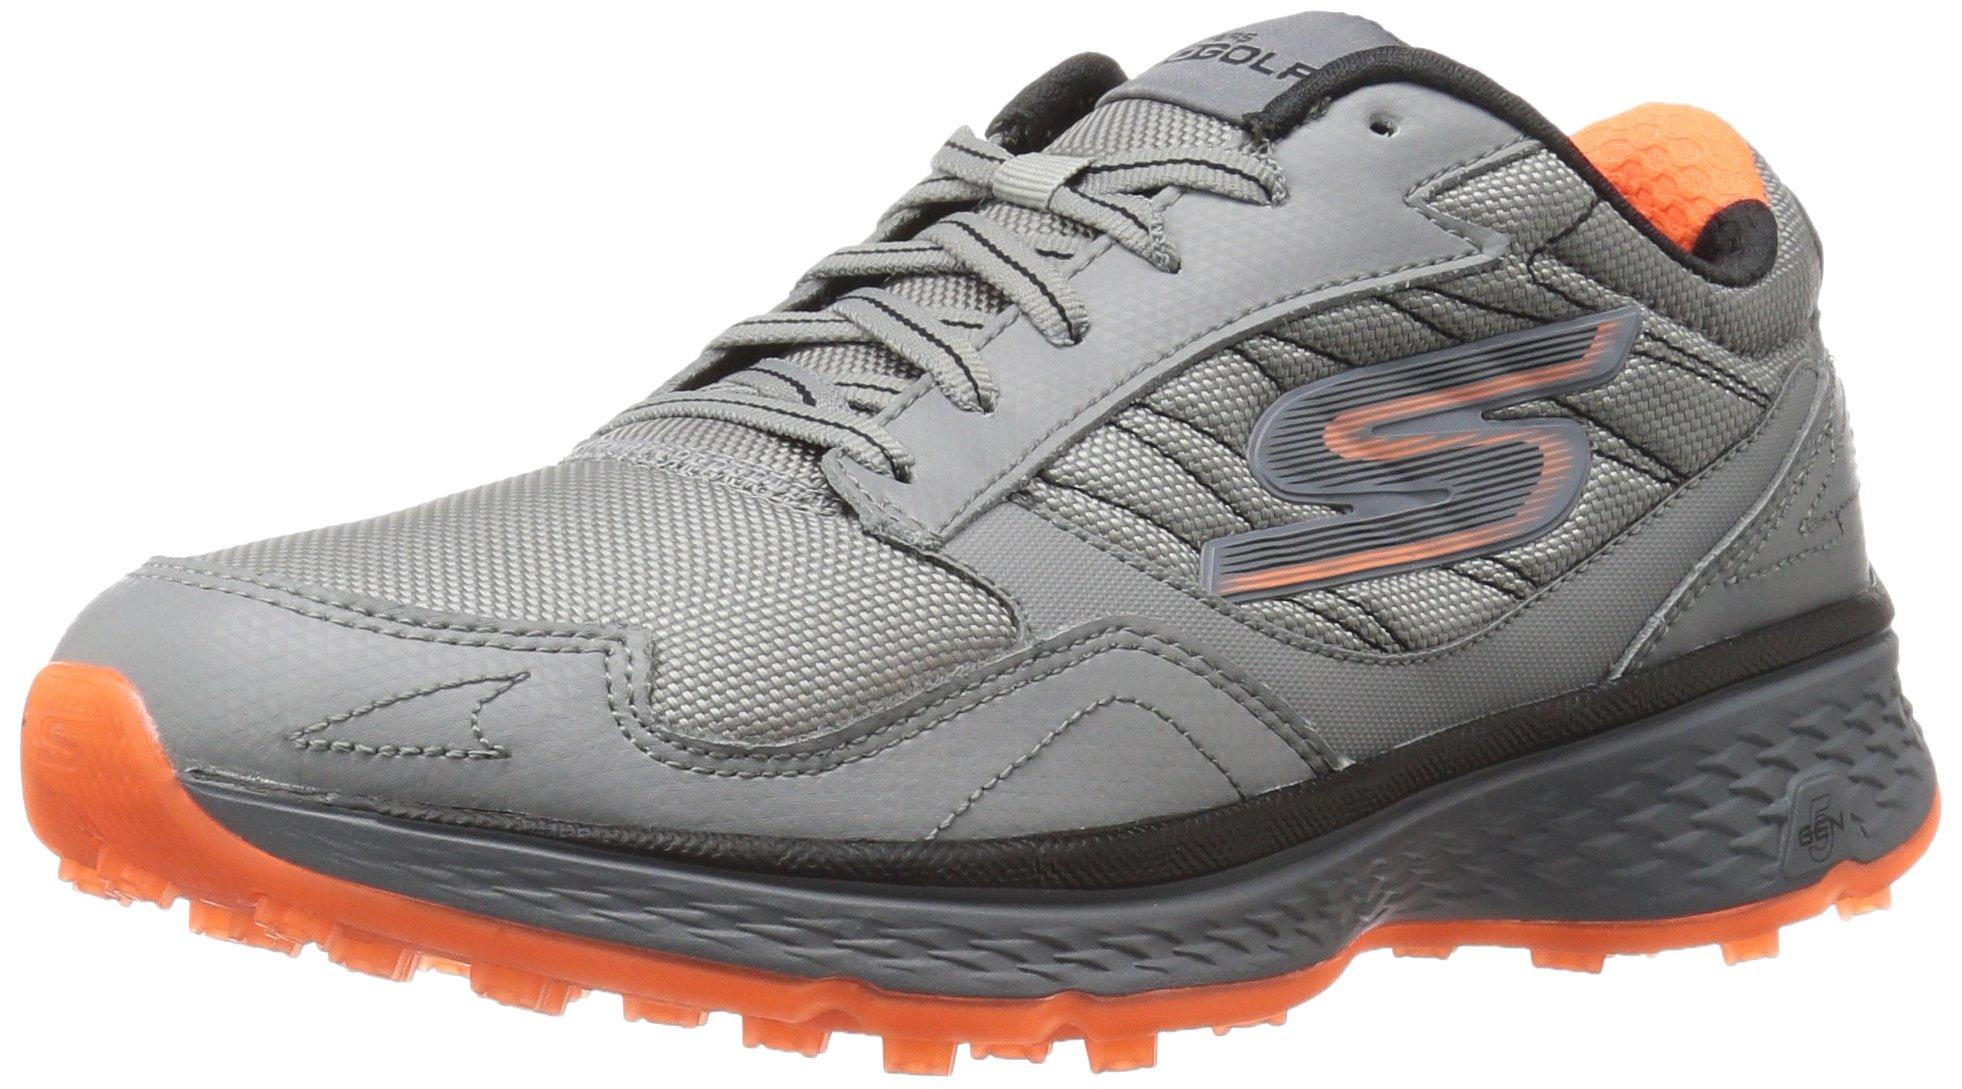 Skechers Golf Men's Go Golf Fairway Golf Shoe, Gray/Orange, 7.5 M US